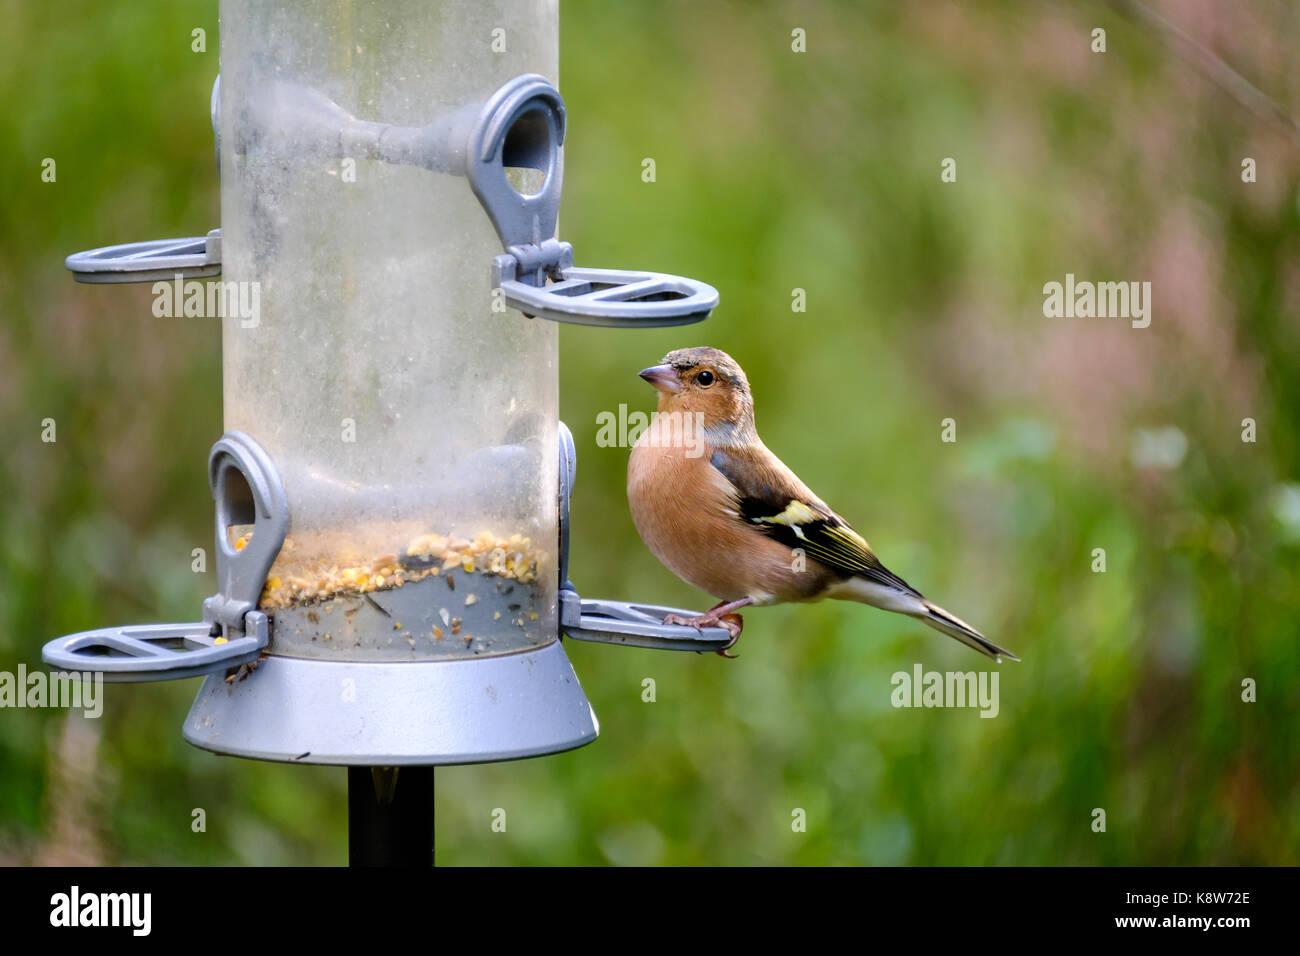 Chaffinch on a bird feeder - Stock Image